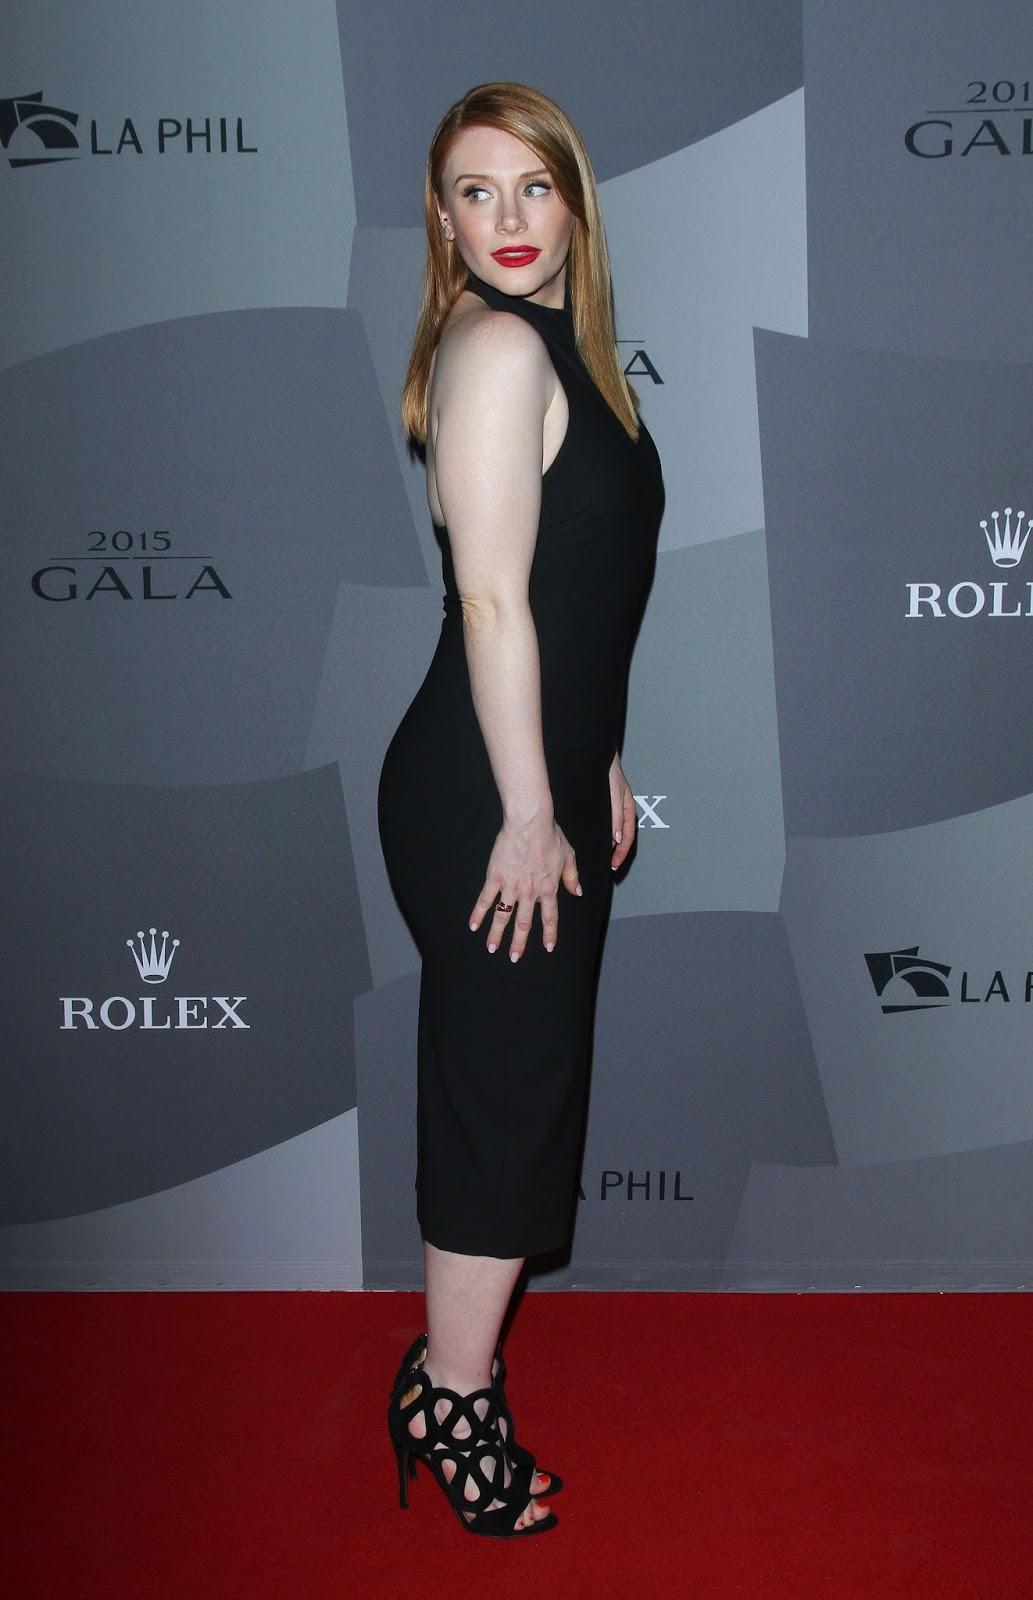 Pete's Dragon actress Full HQ Photos & Wallpapers Bryce Dallas Howard At La Philharmonic 2015/2016 Season Opening